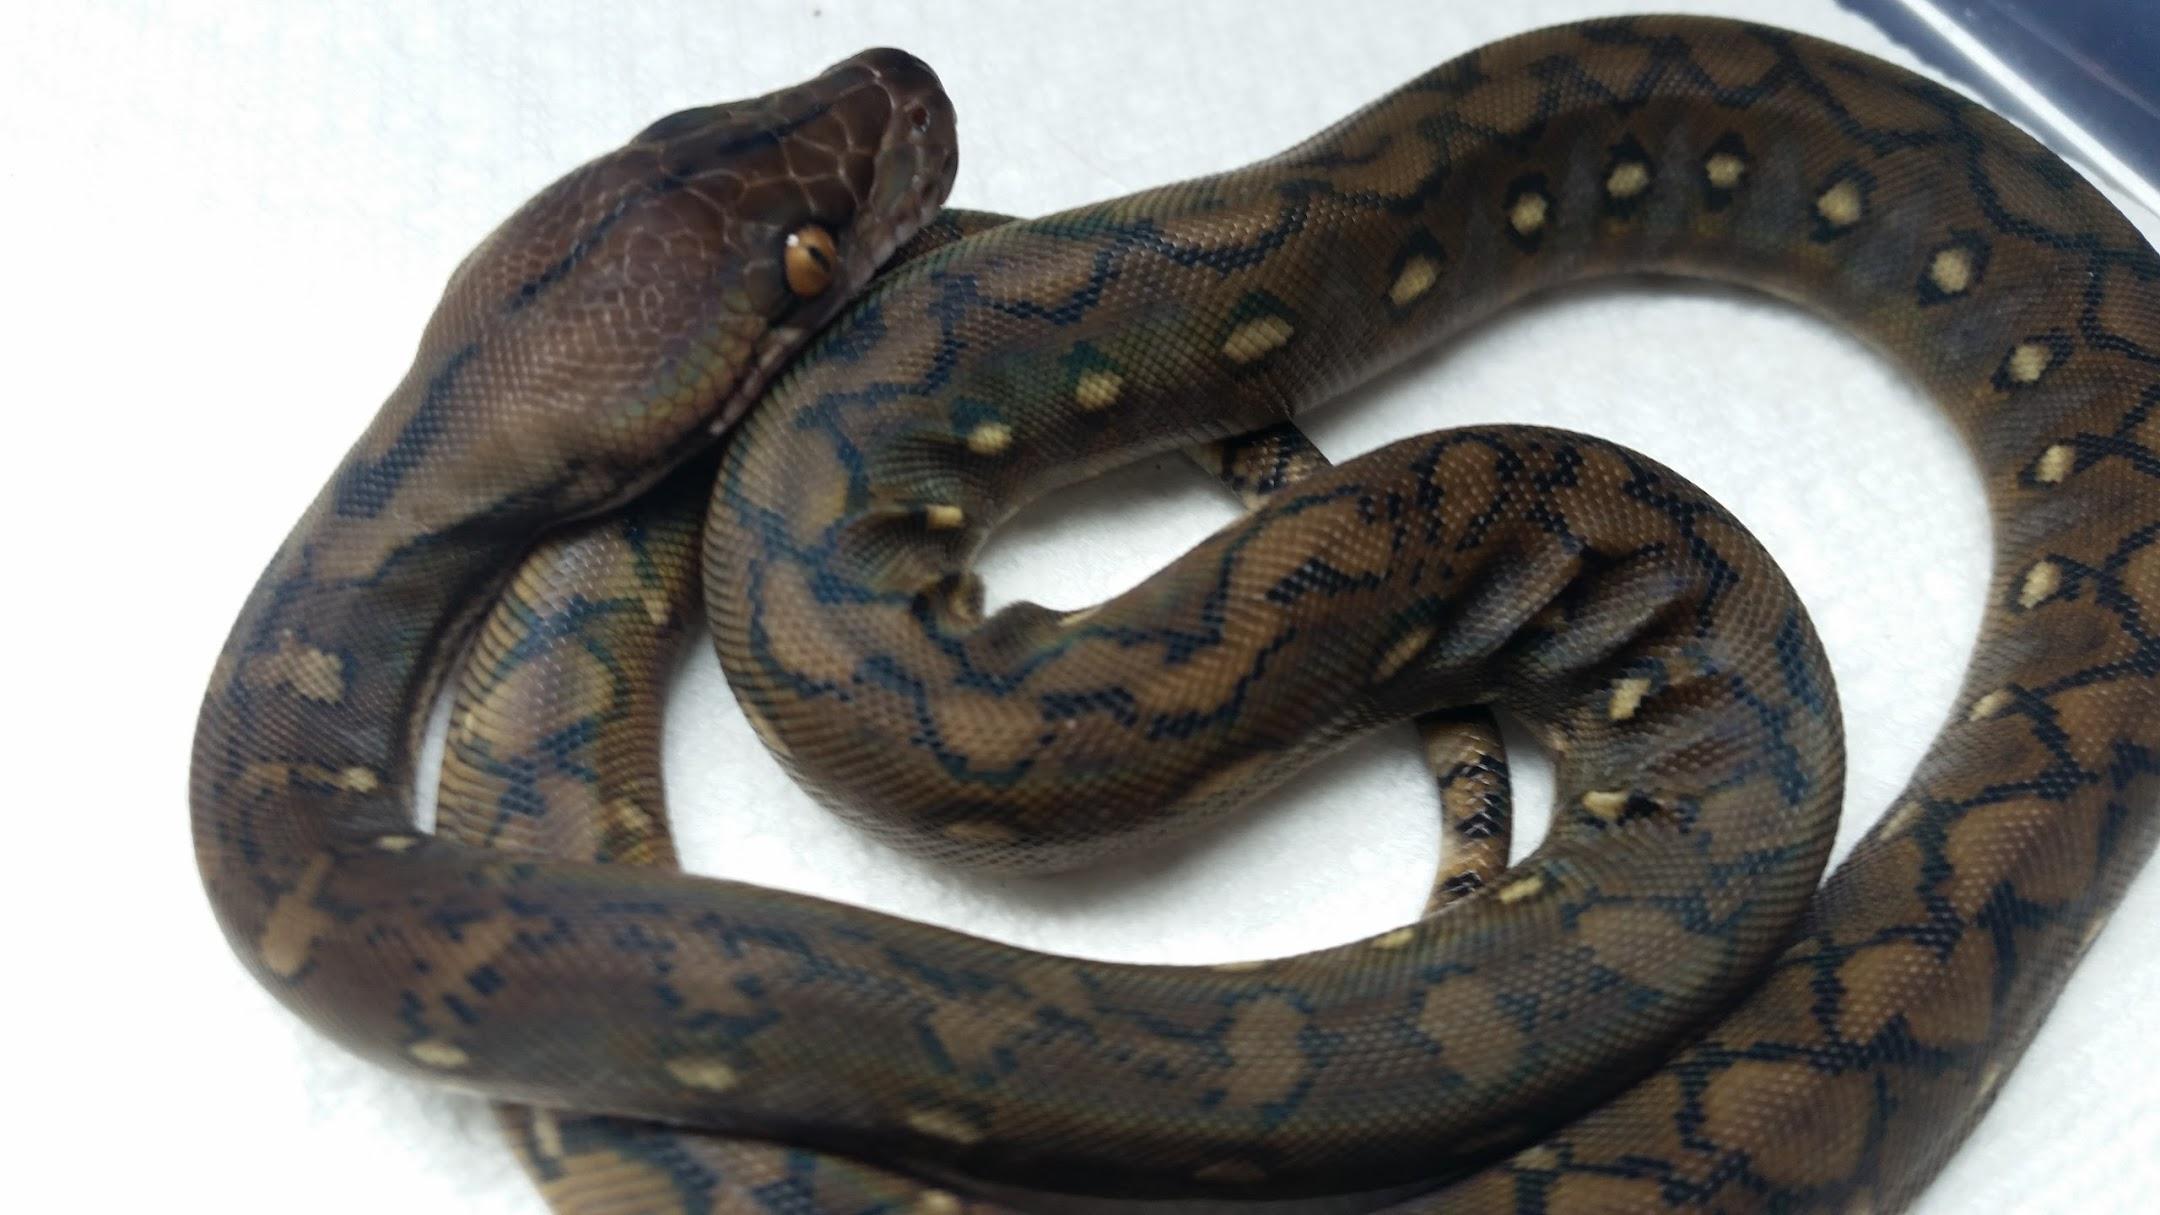 Hatchling Male SD Kalatoa, January 2017 baby.